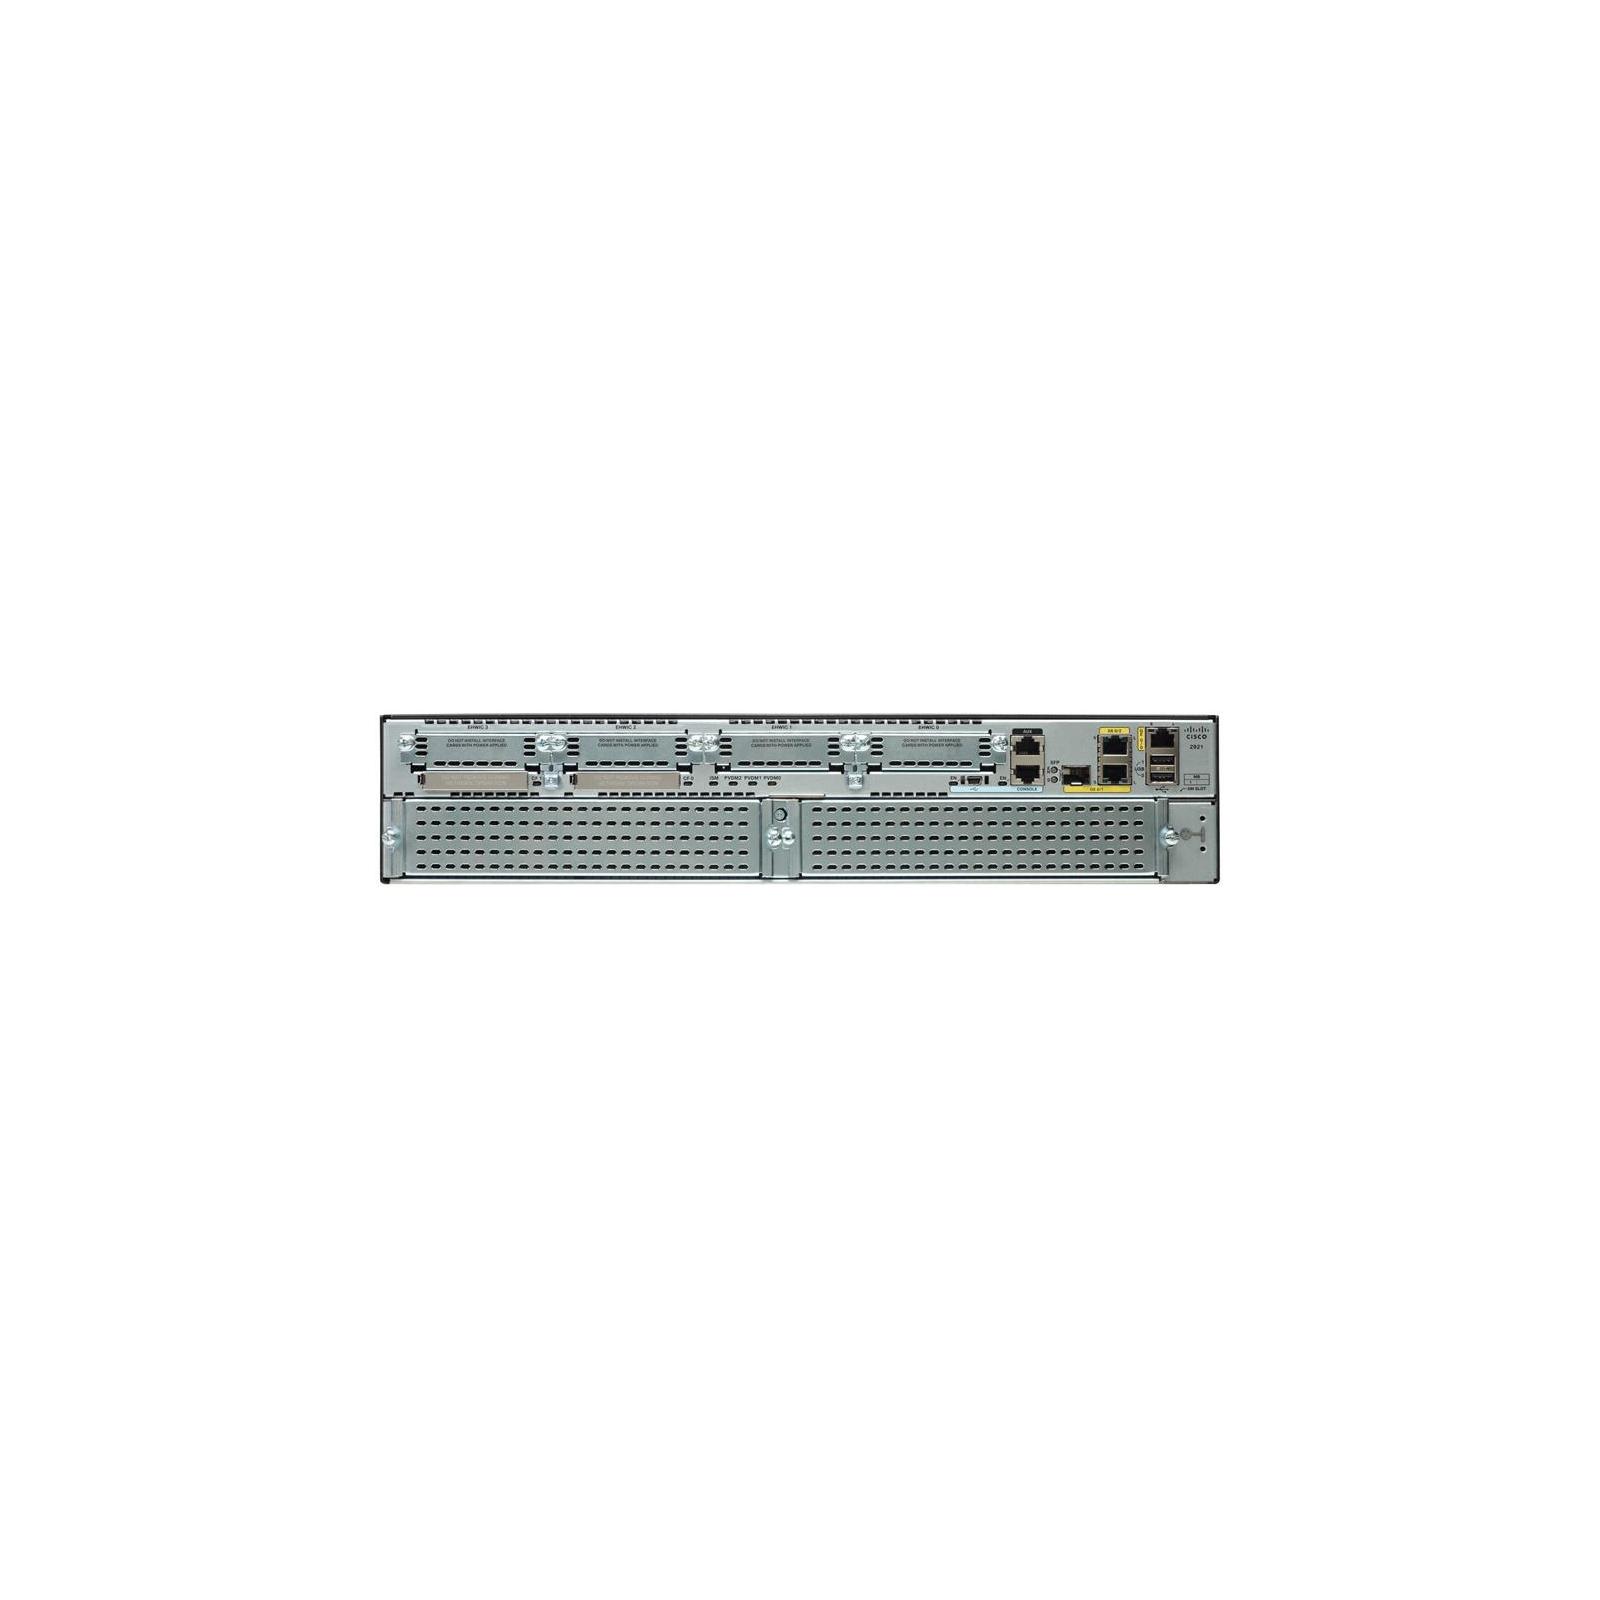 Маршрутизатор Cisco CISCO2921-V/K9 изображение 2